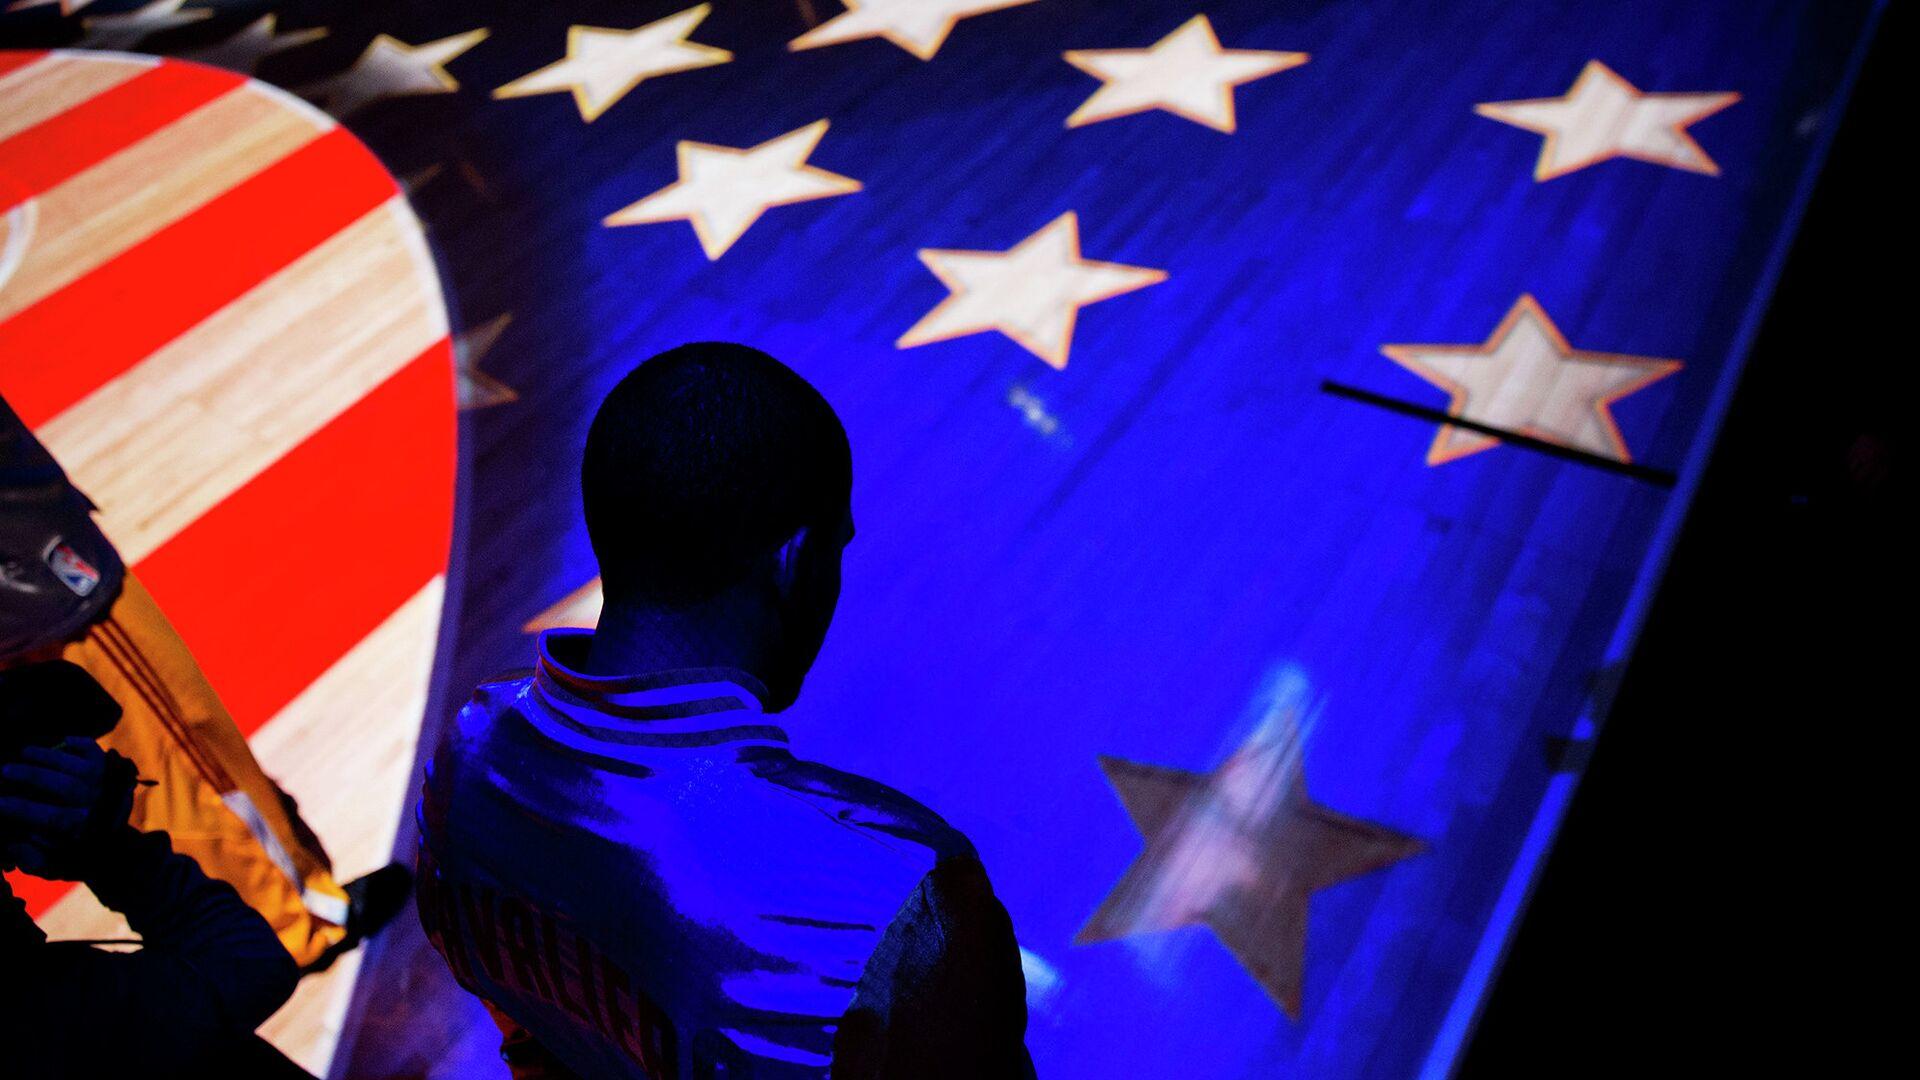 Человек на фоне американского флага - РИА Новости, 1920, 03.09.2020